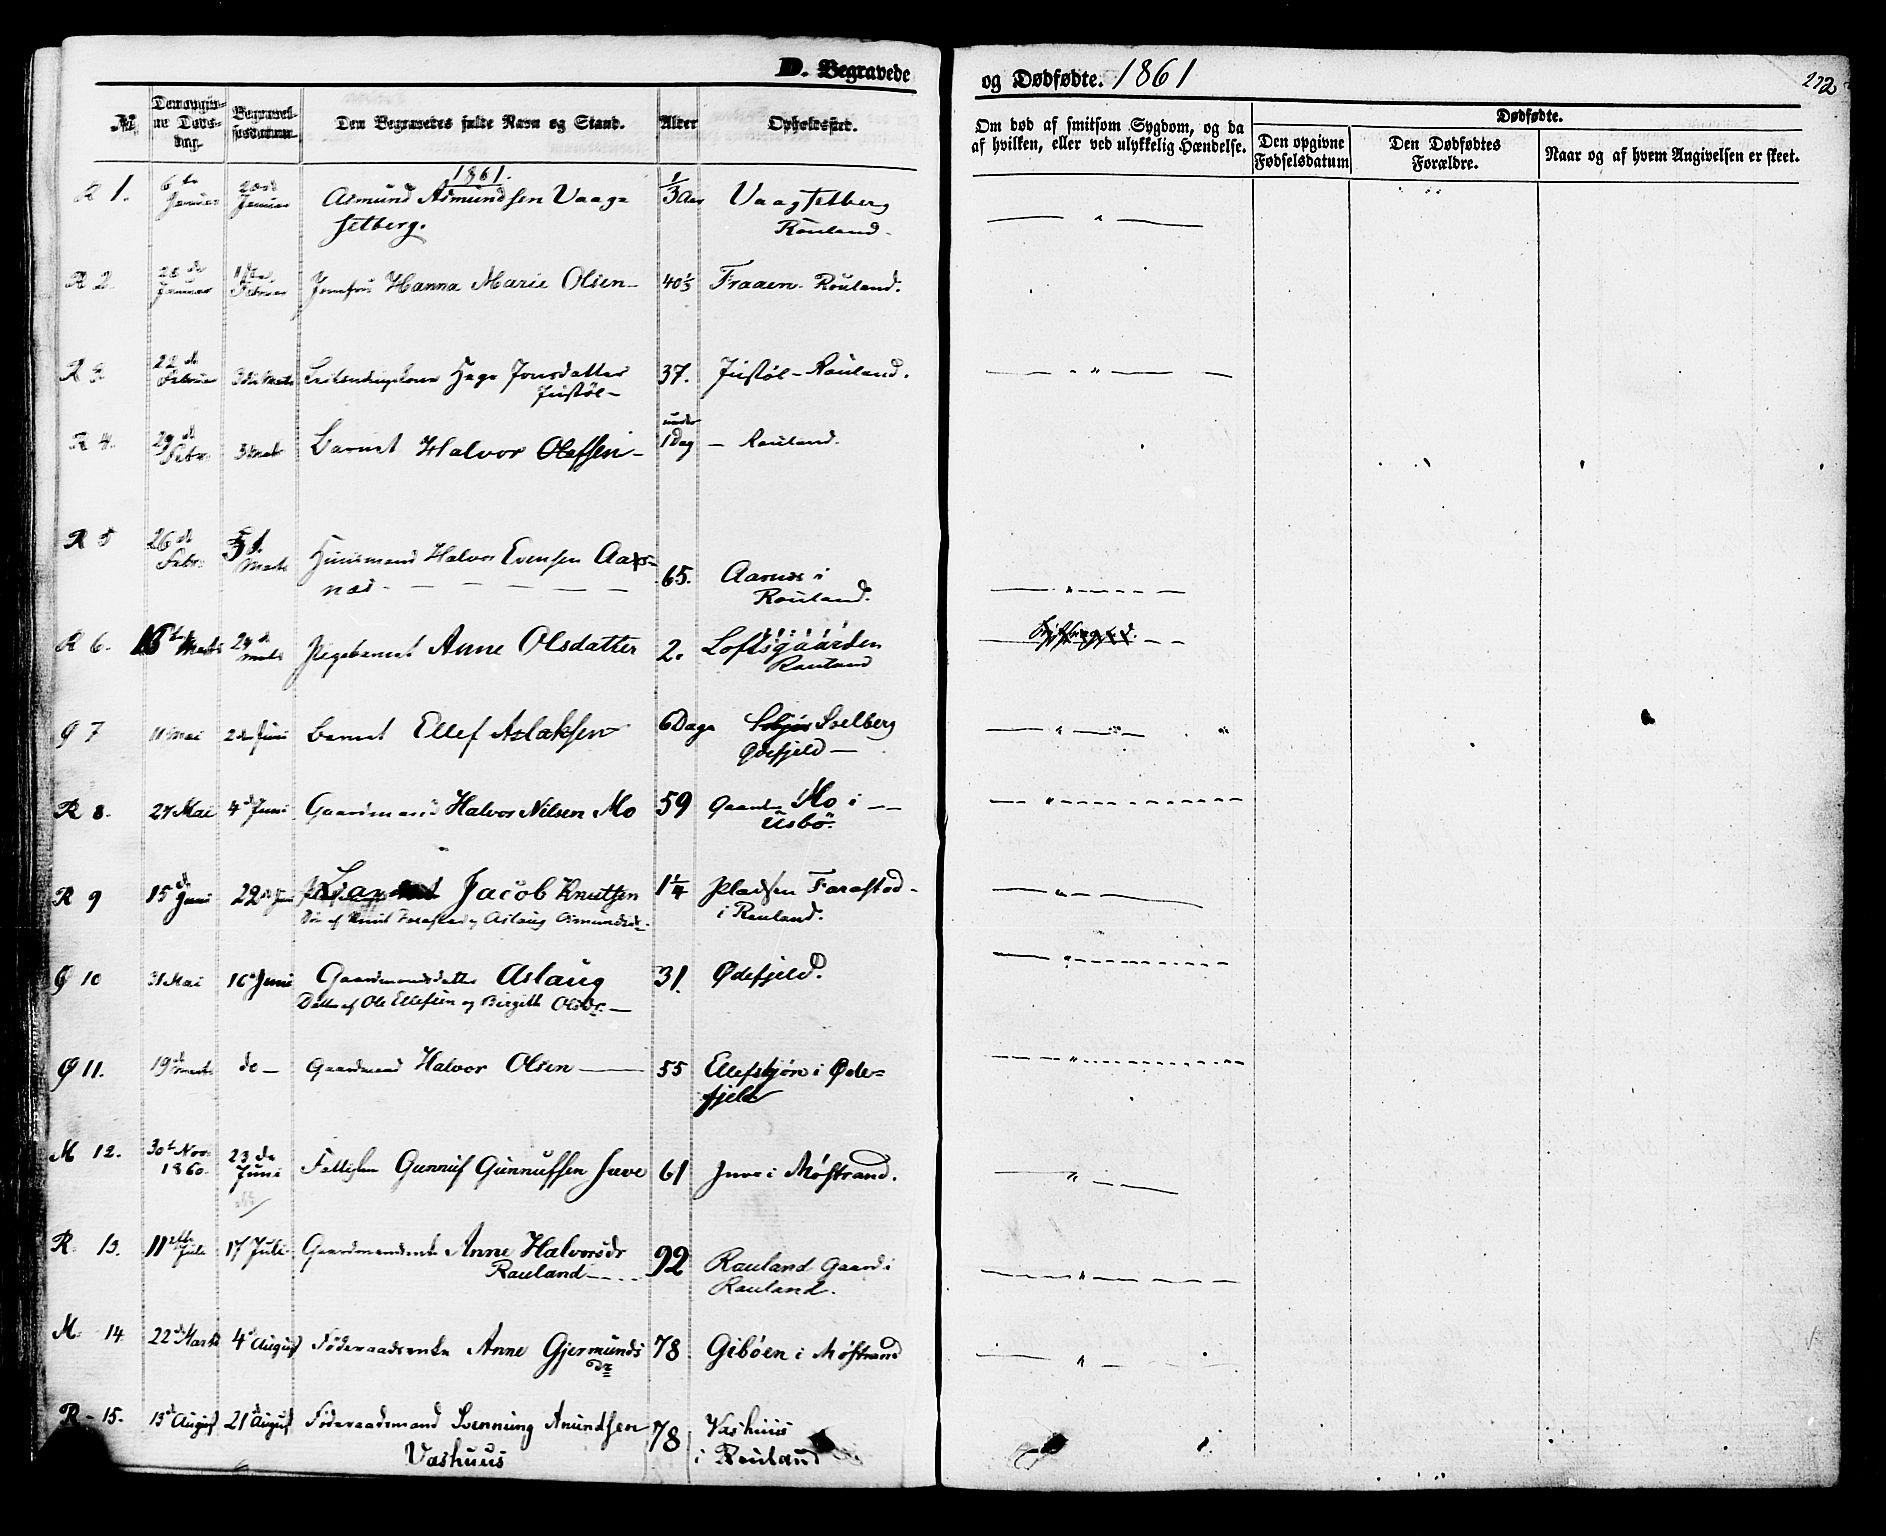 SAKO, Rauland kirkebøker, F/Fa/L0003: Ministerialbok nr. 3, 1859-1886, s. 272